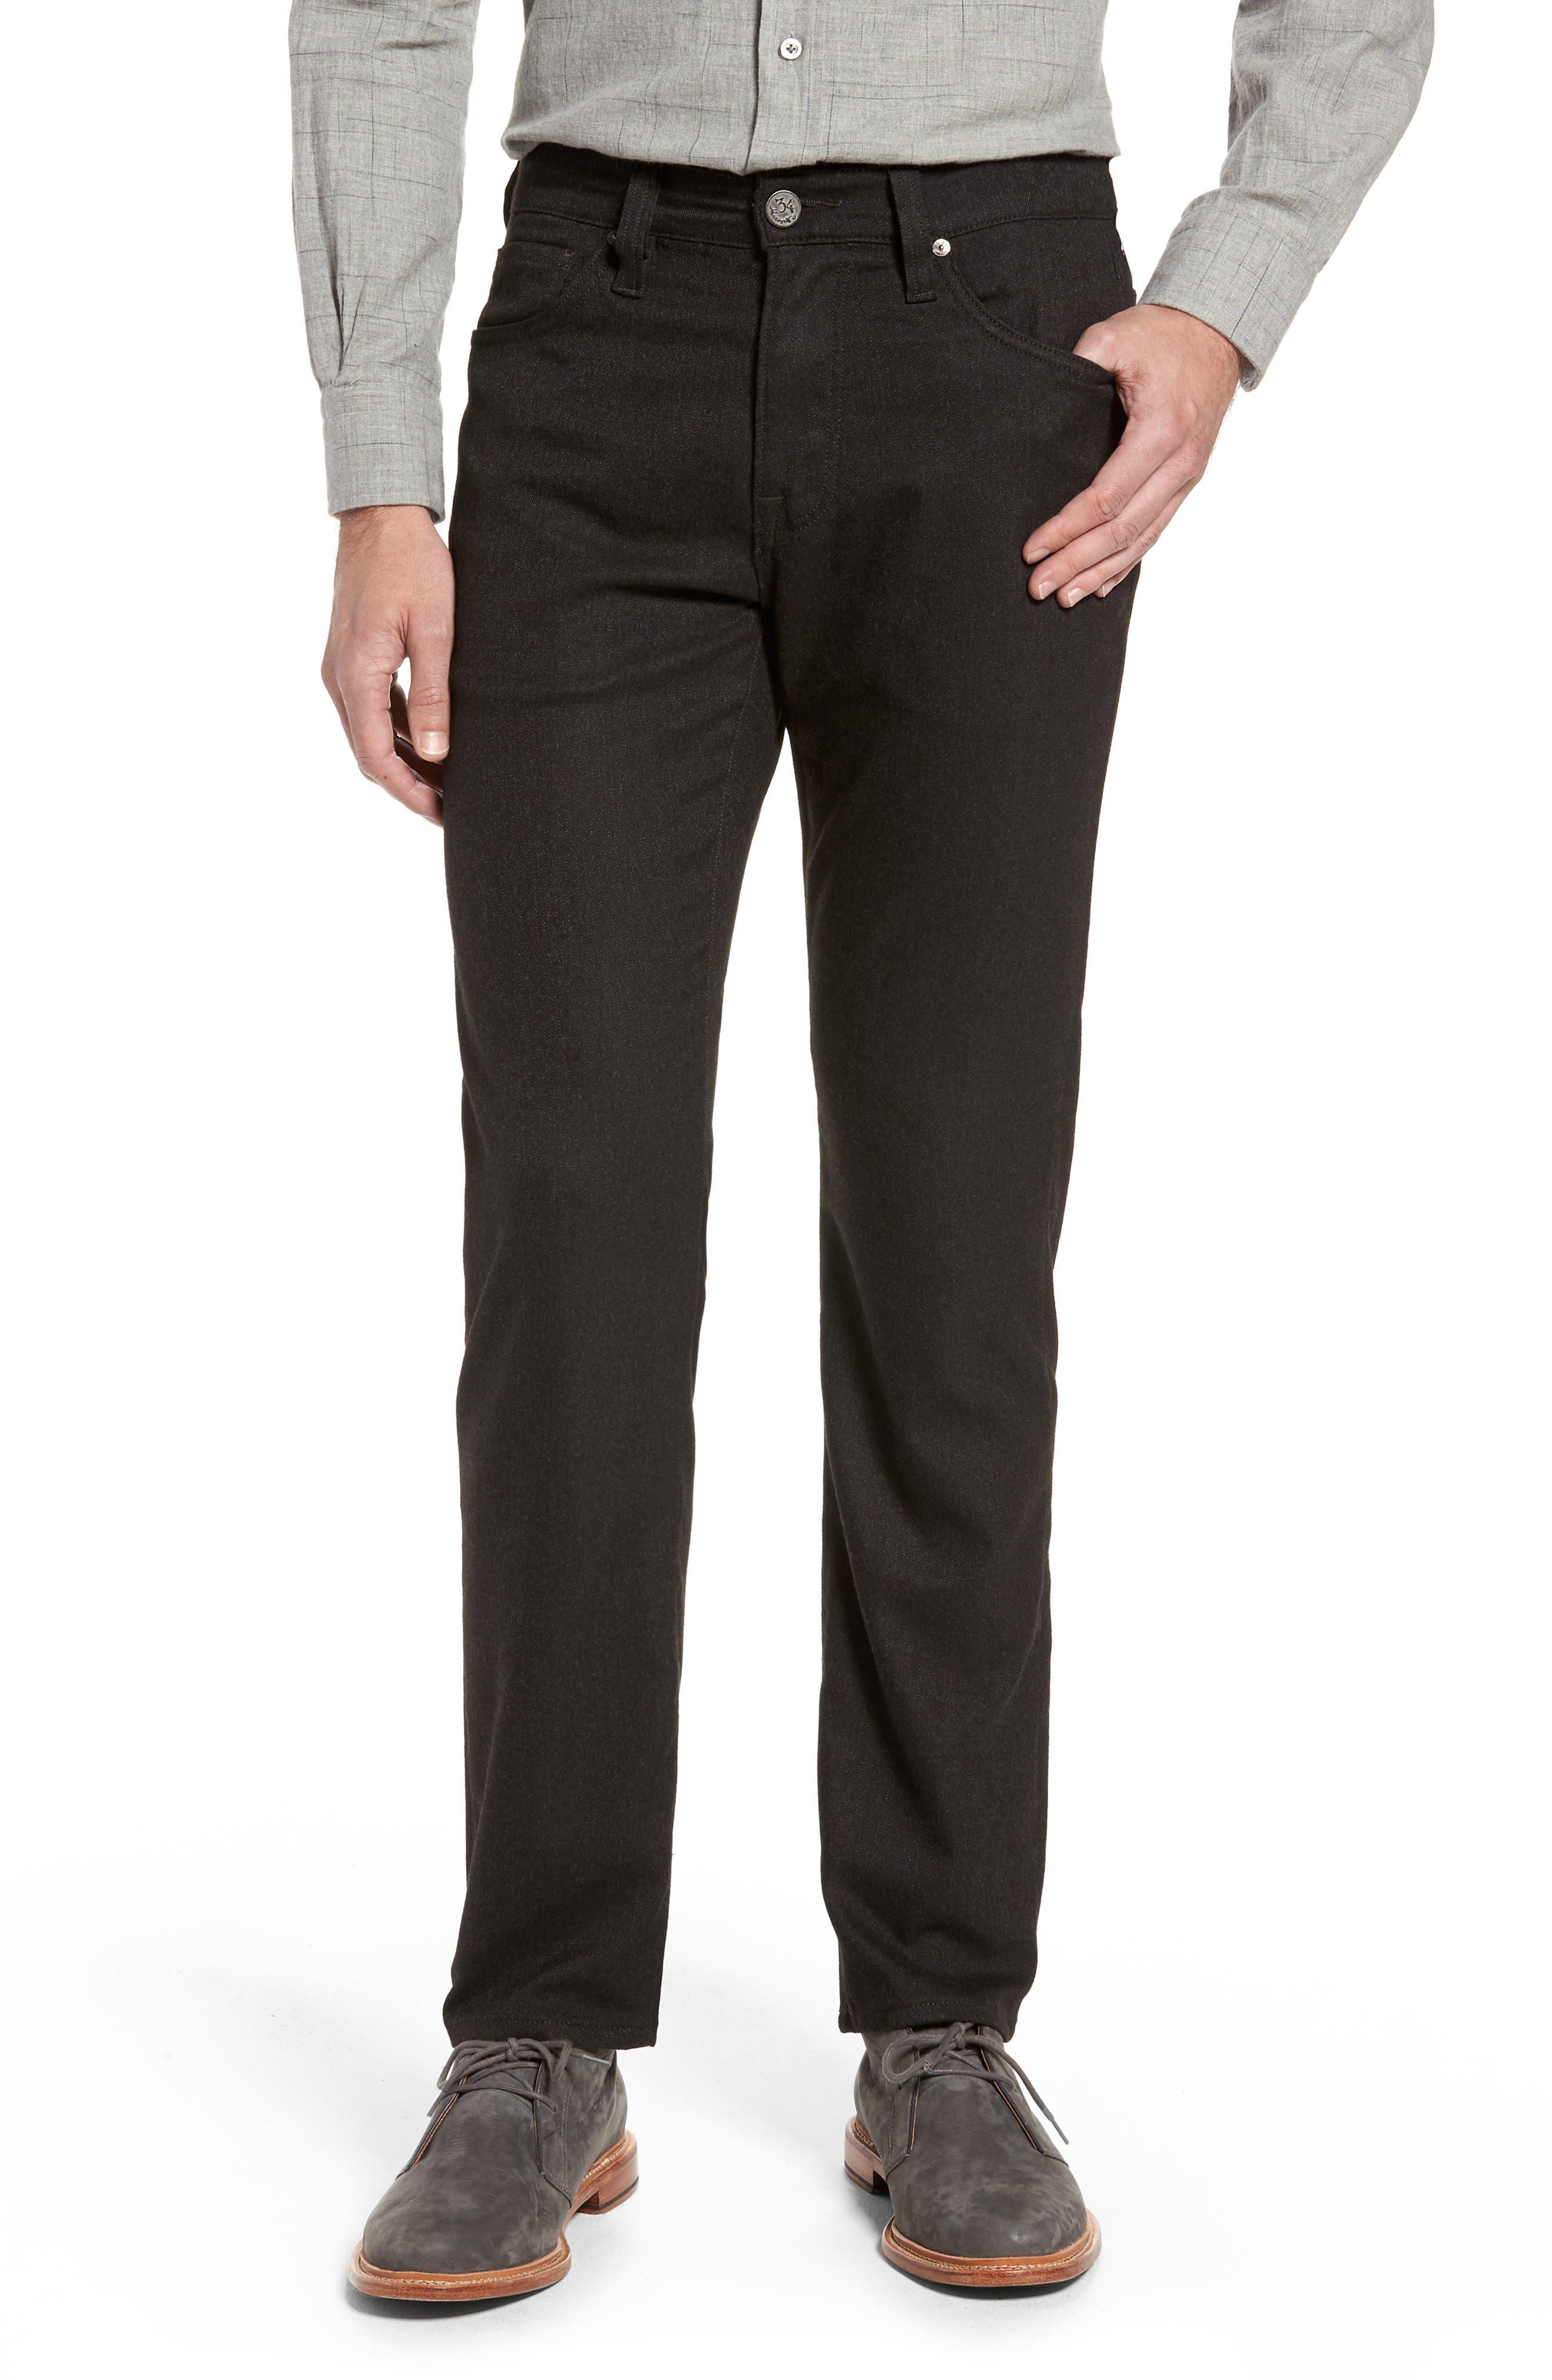 Courage Straight Leg Tweed Pants,                         Main,                         color, Brown Feather Tweed